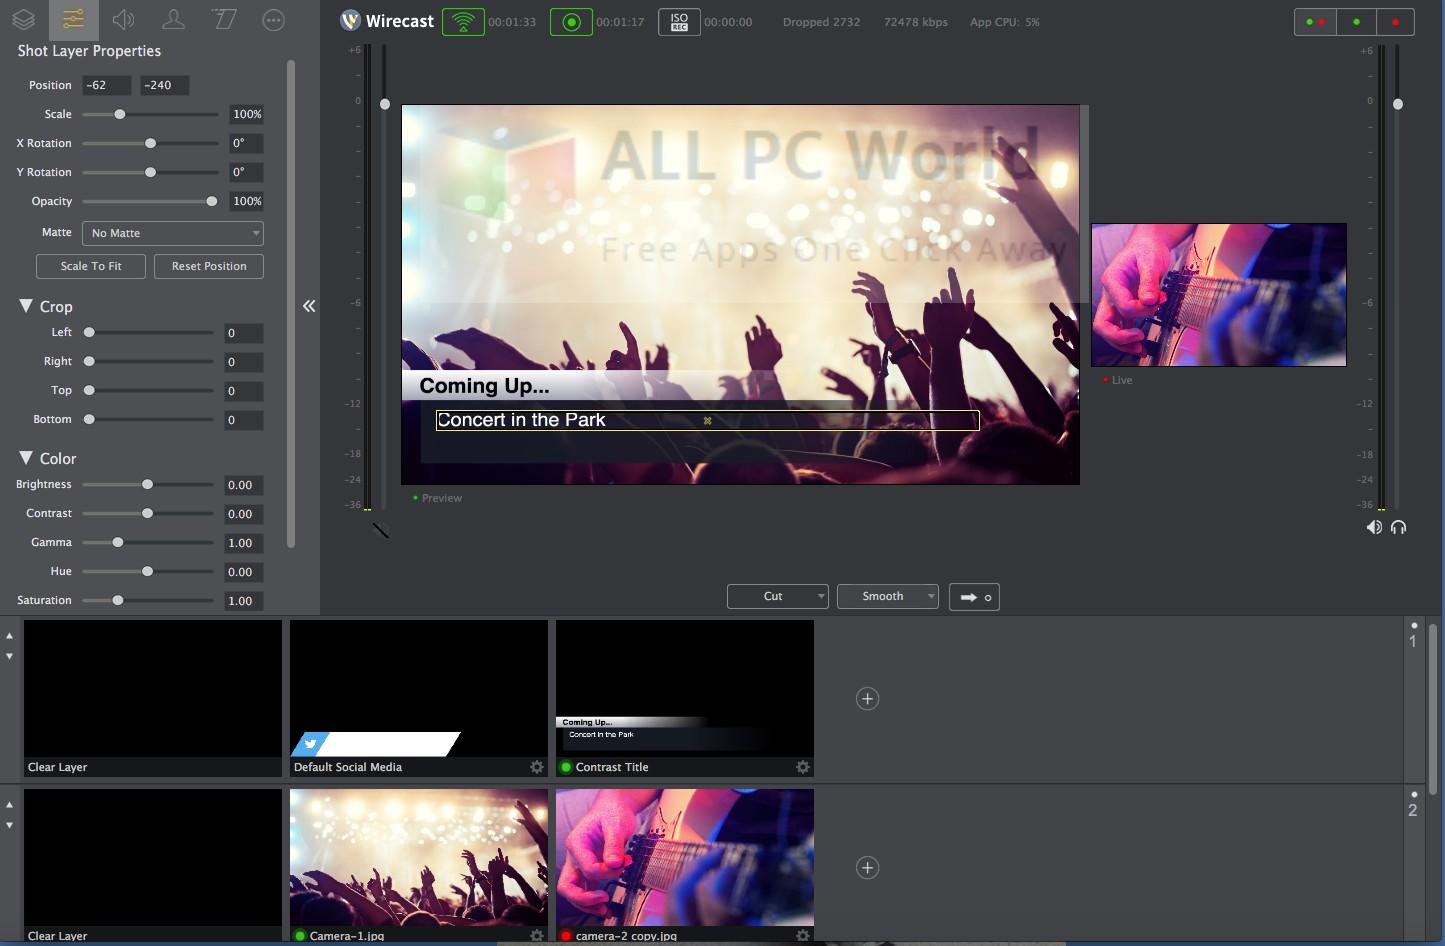 Wirecast Pro 8.3.0 Setup Free Download